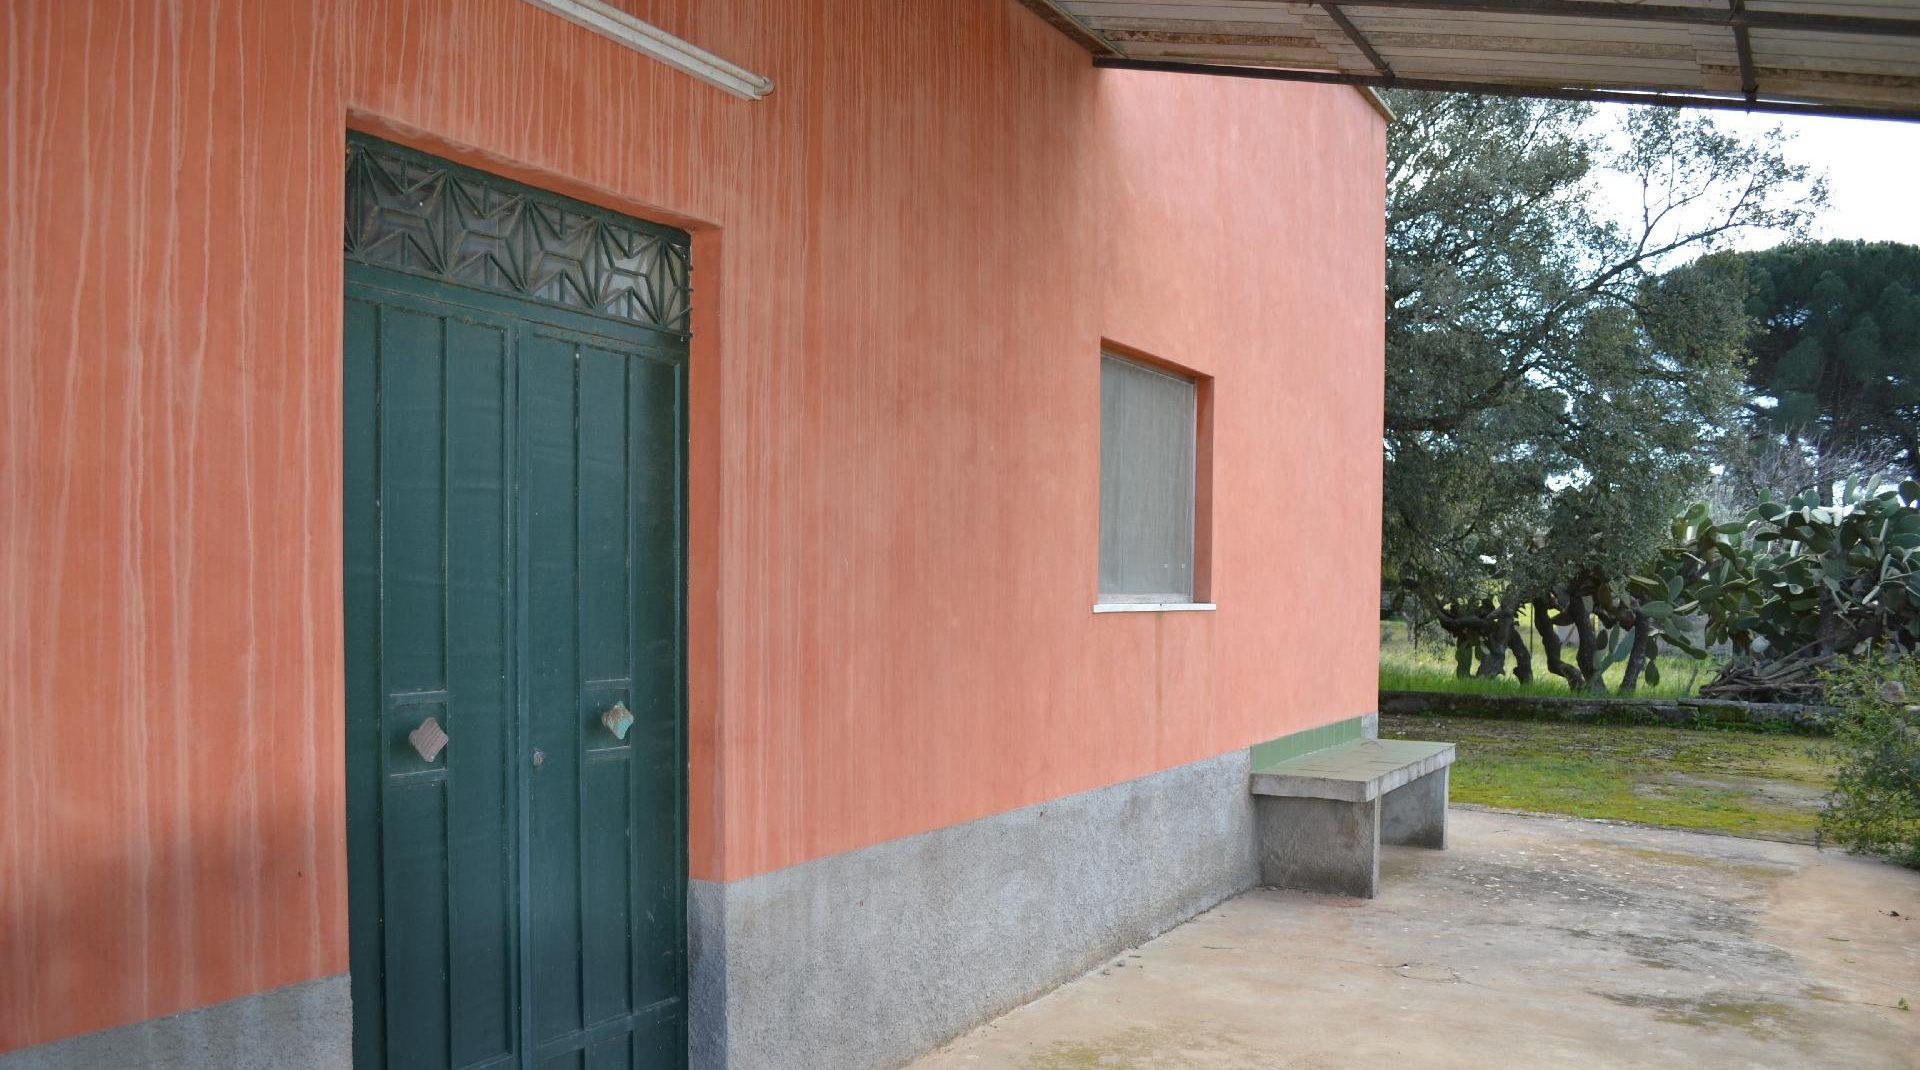 Villetta in Vendita a Caltagirone (Catania)